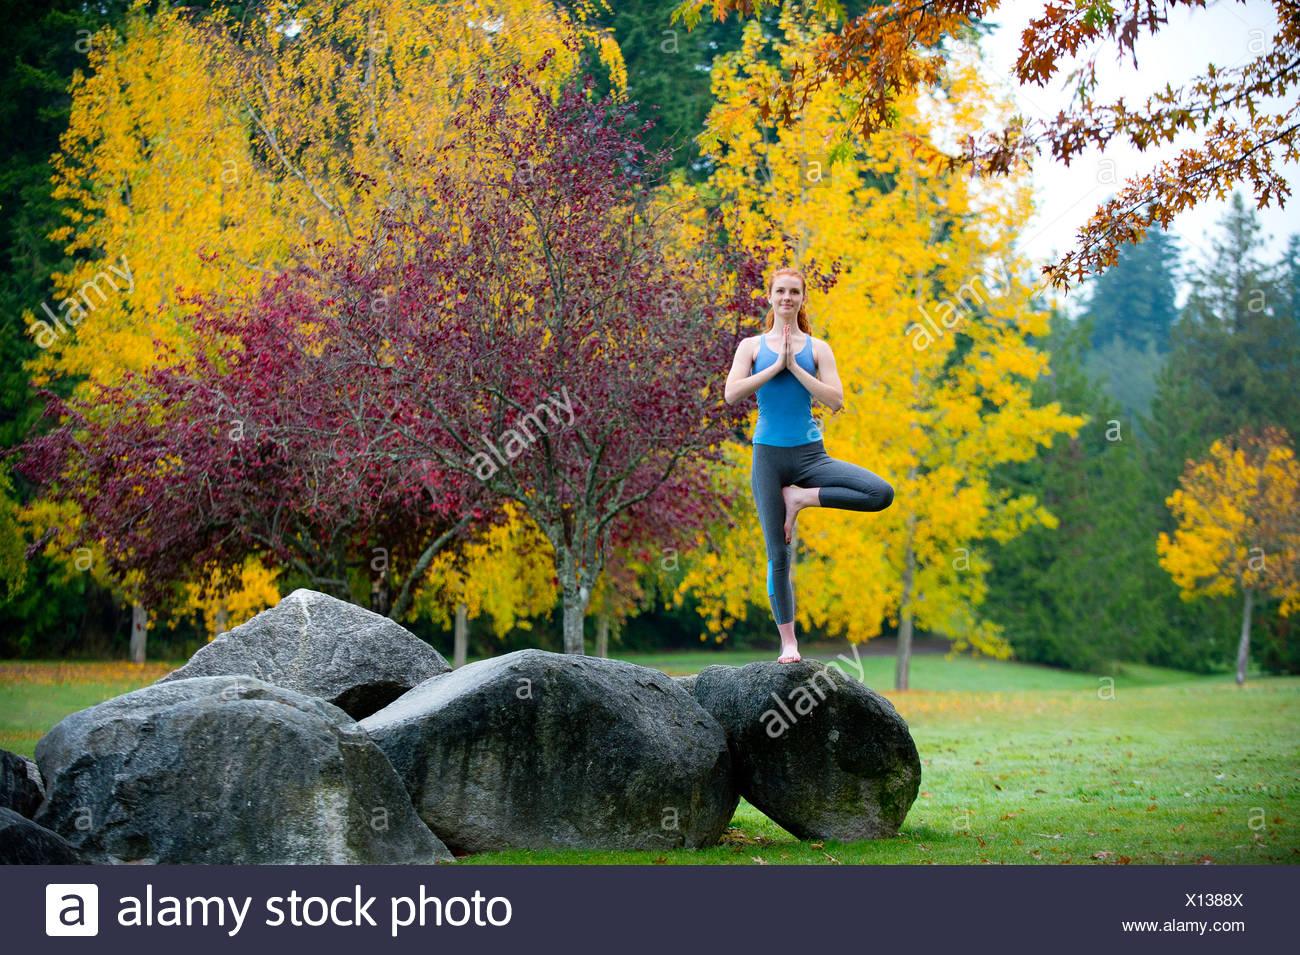 Young woman practising yoga on rock - Stock Image